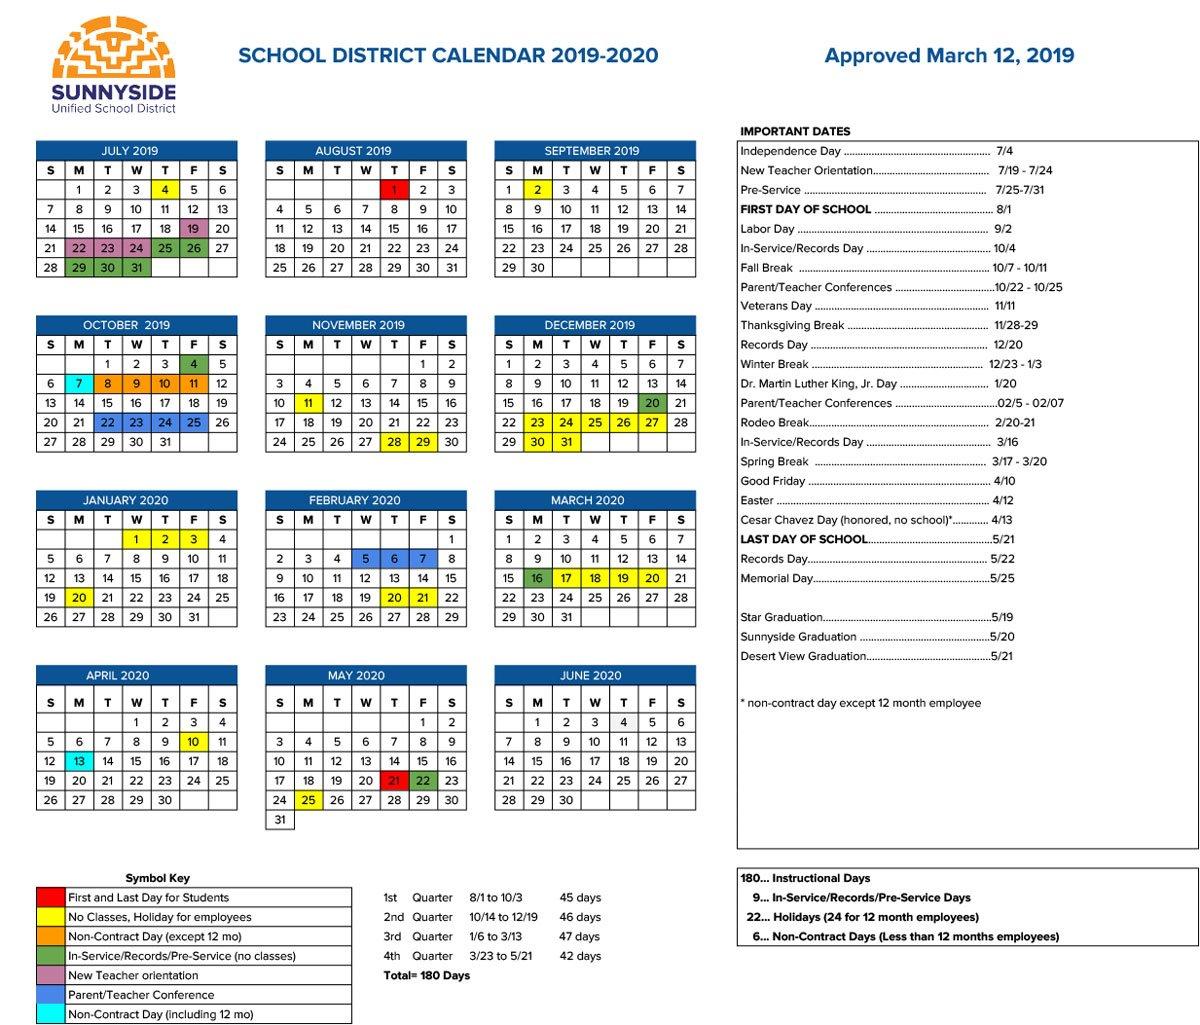 Academic Calendar | Sunnyside Unified School District School District 2 Calendar 2019